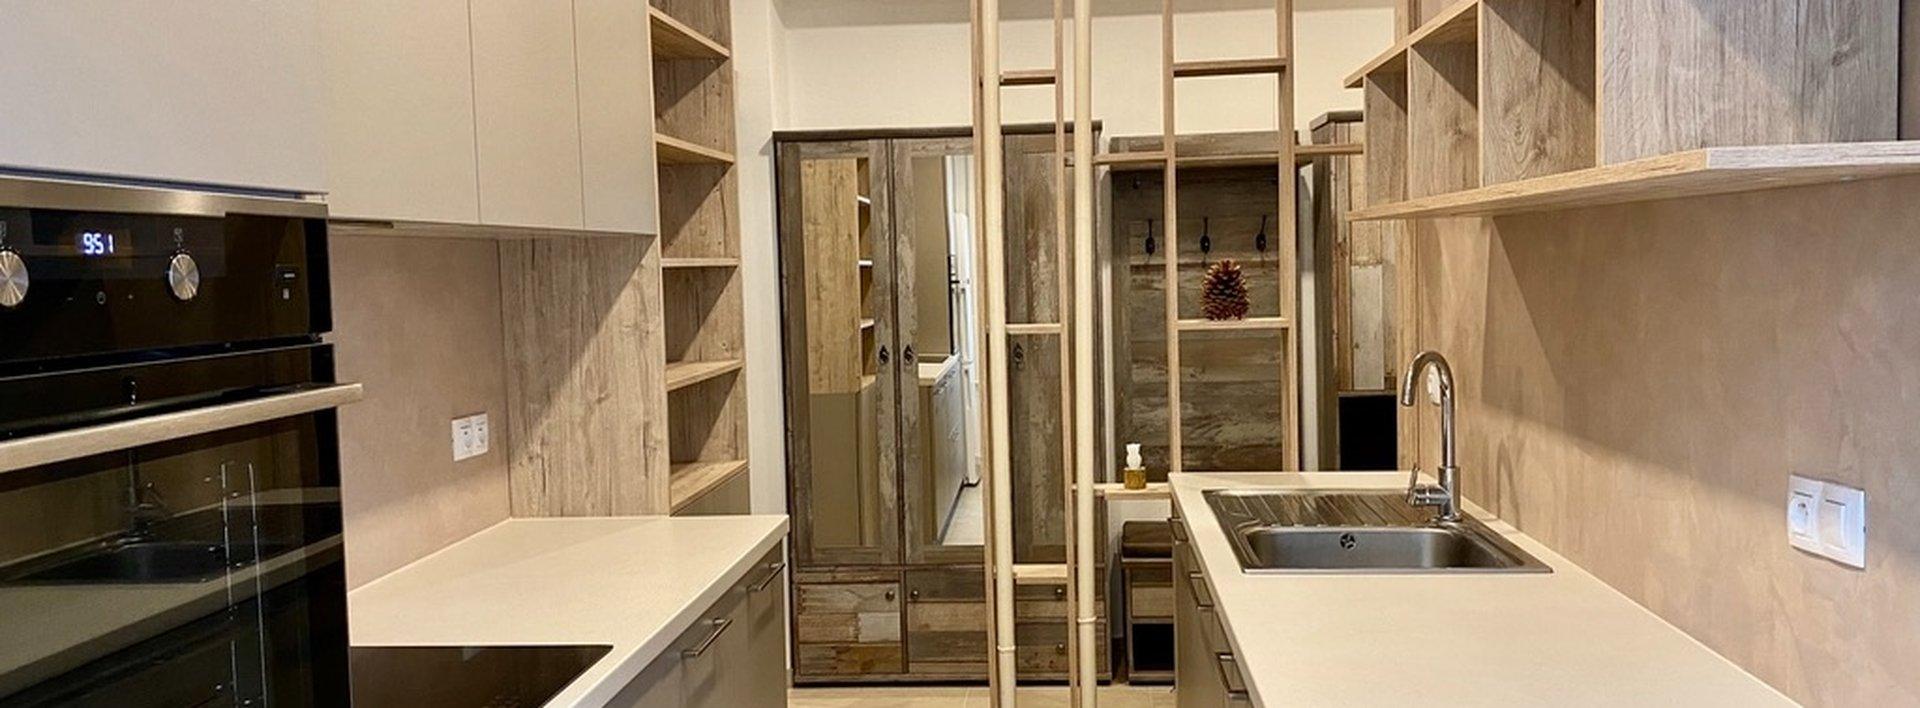 Pronájem bytu 3+1 s balkónem, 64 m² - Liberec - Kristiánov, ulice SNP, Ev.č.: N49285